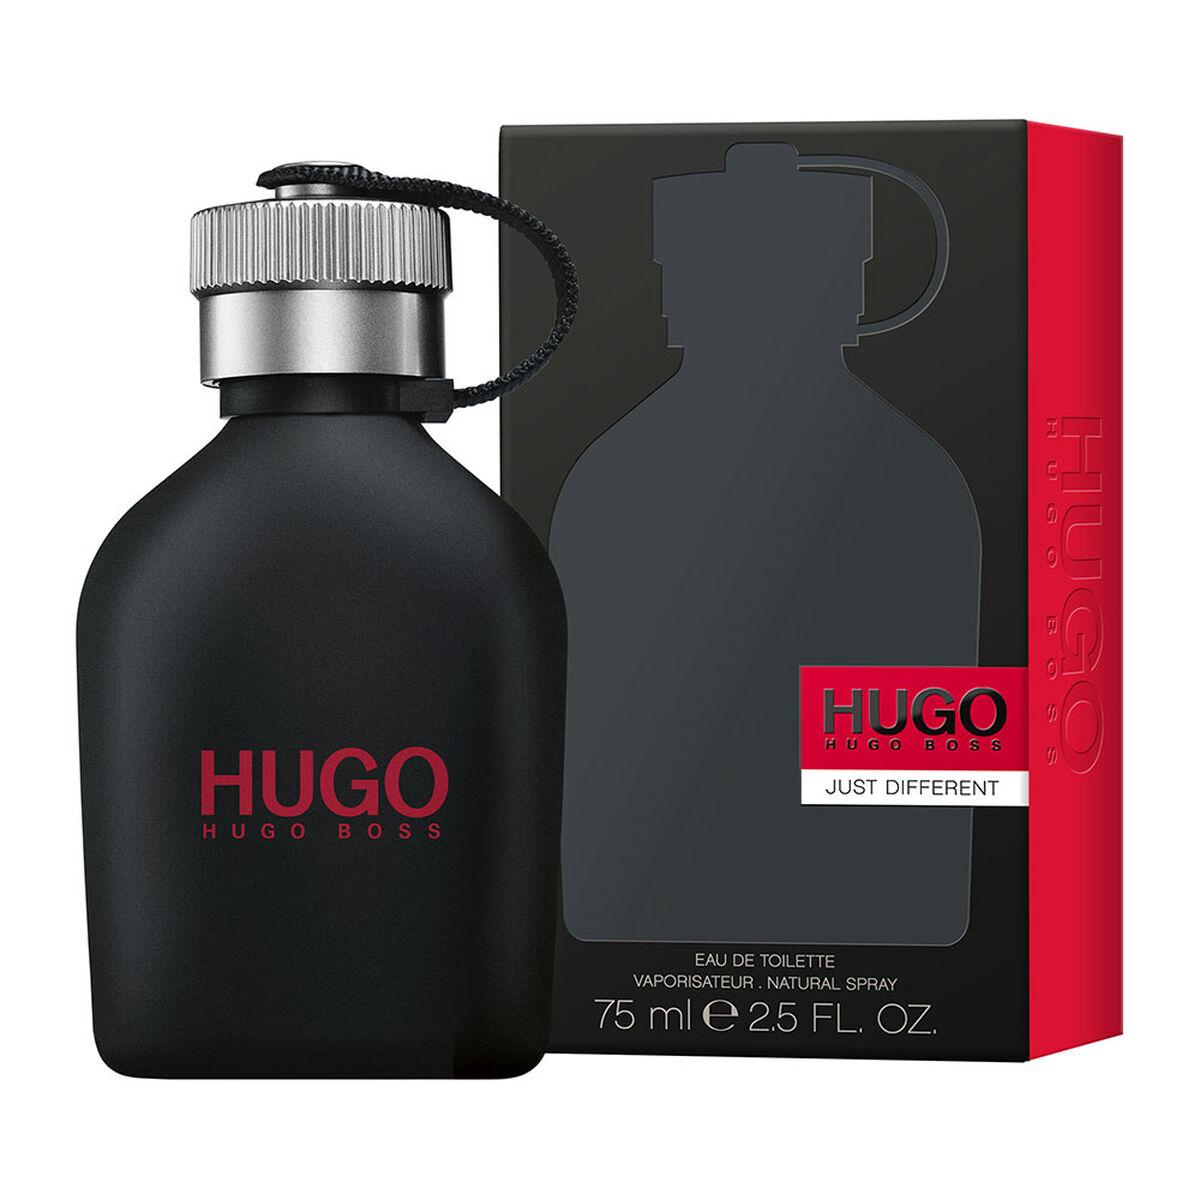 Hugo Just Different Edt 75 ml